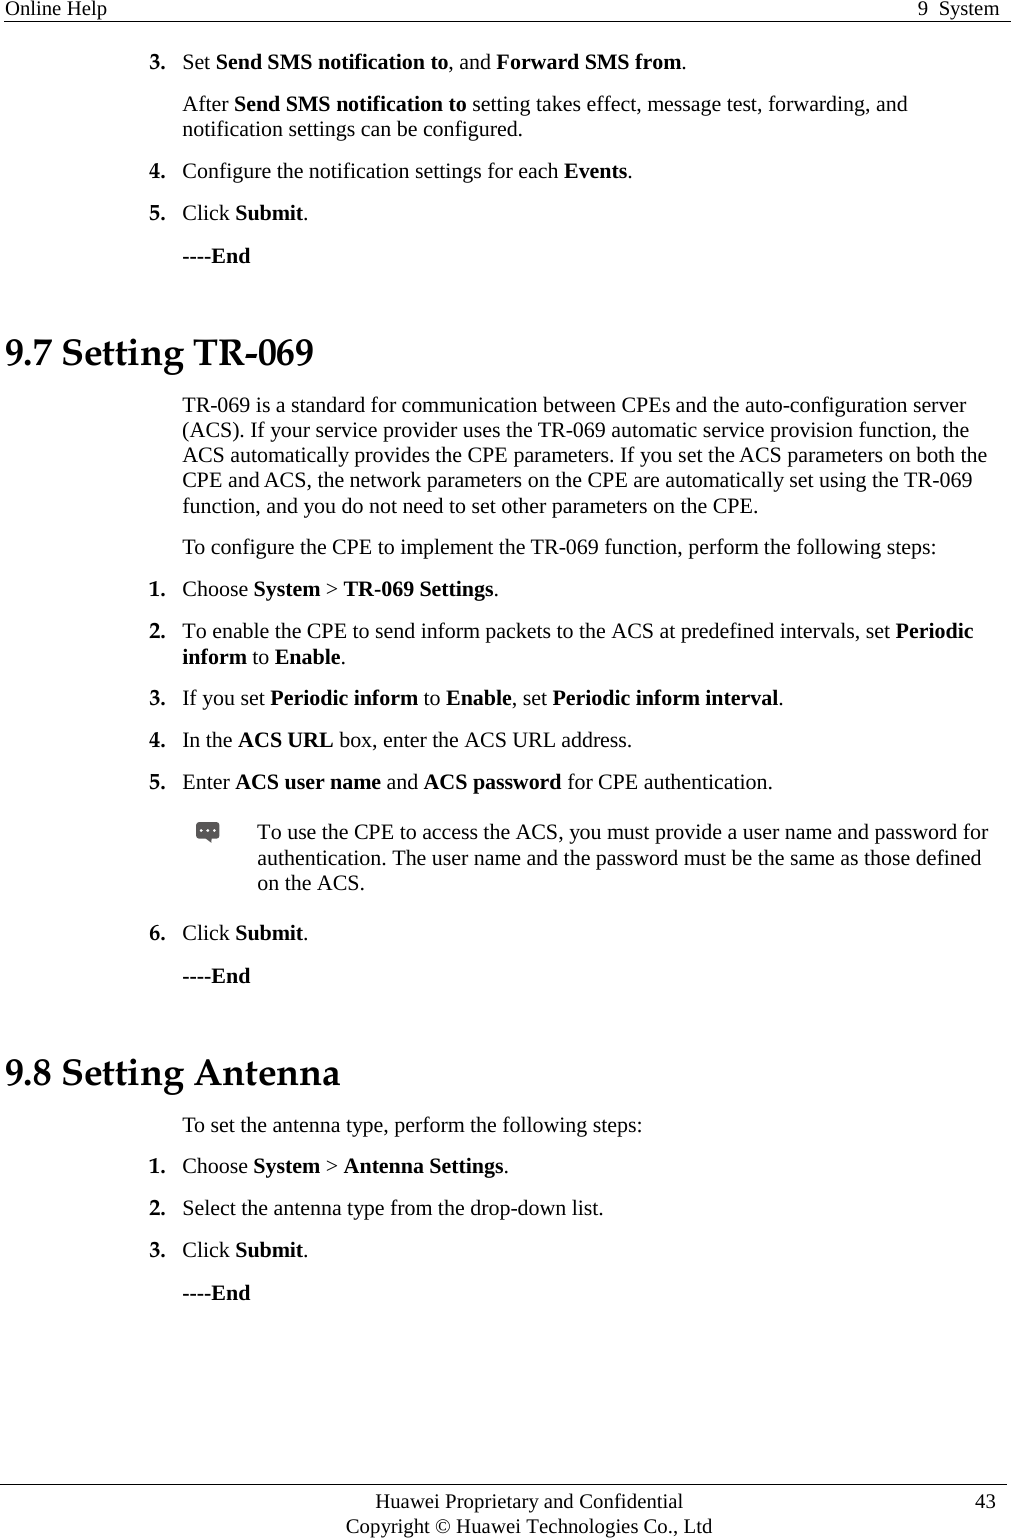 Huawei B593s 22 User Guide(B593S 22, 01, EN)